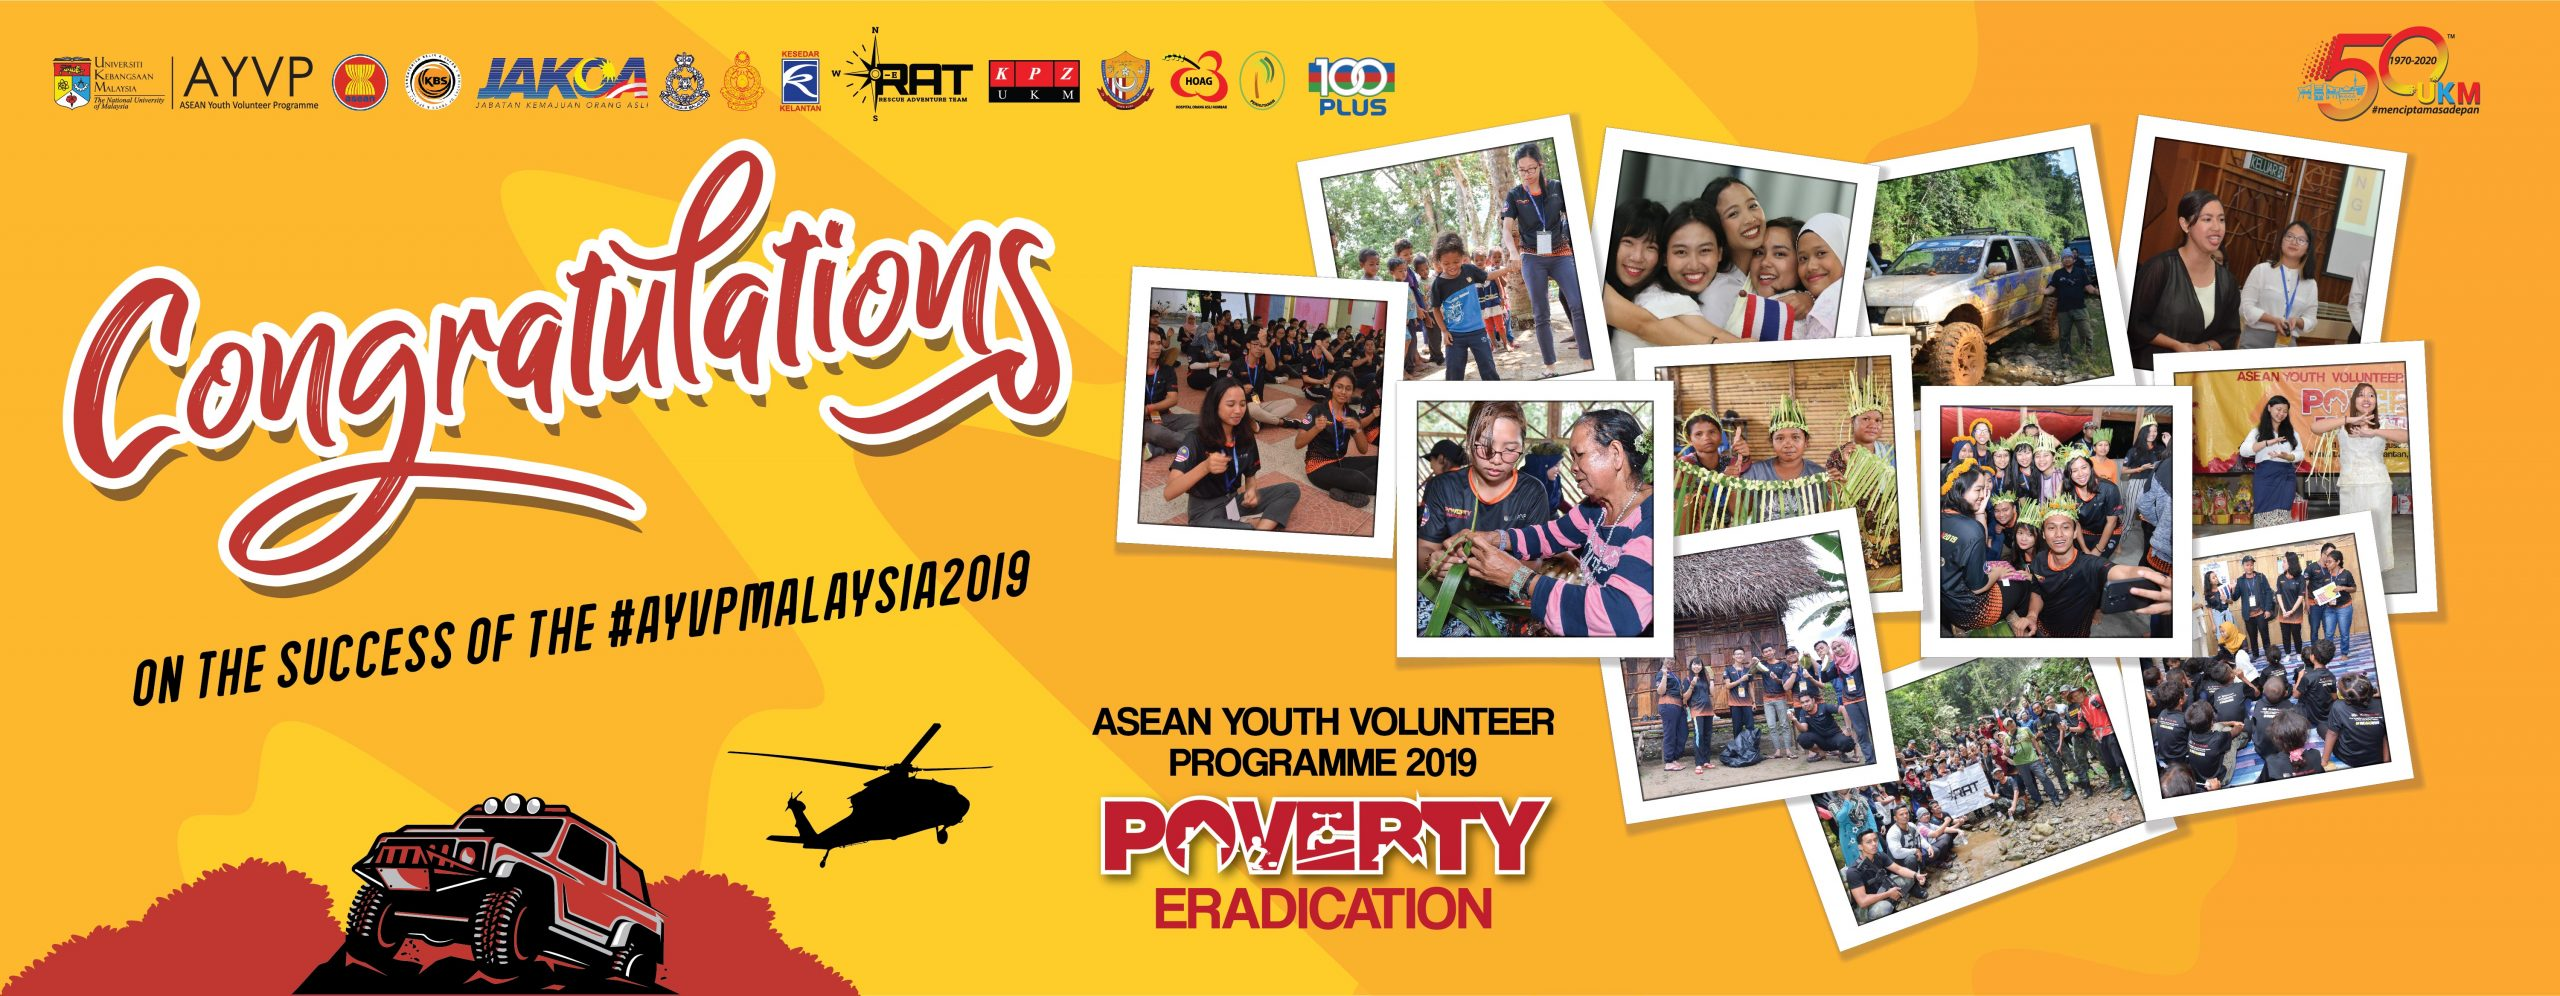 AYVP Malaysia 2019